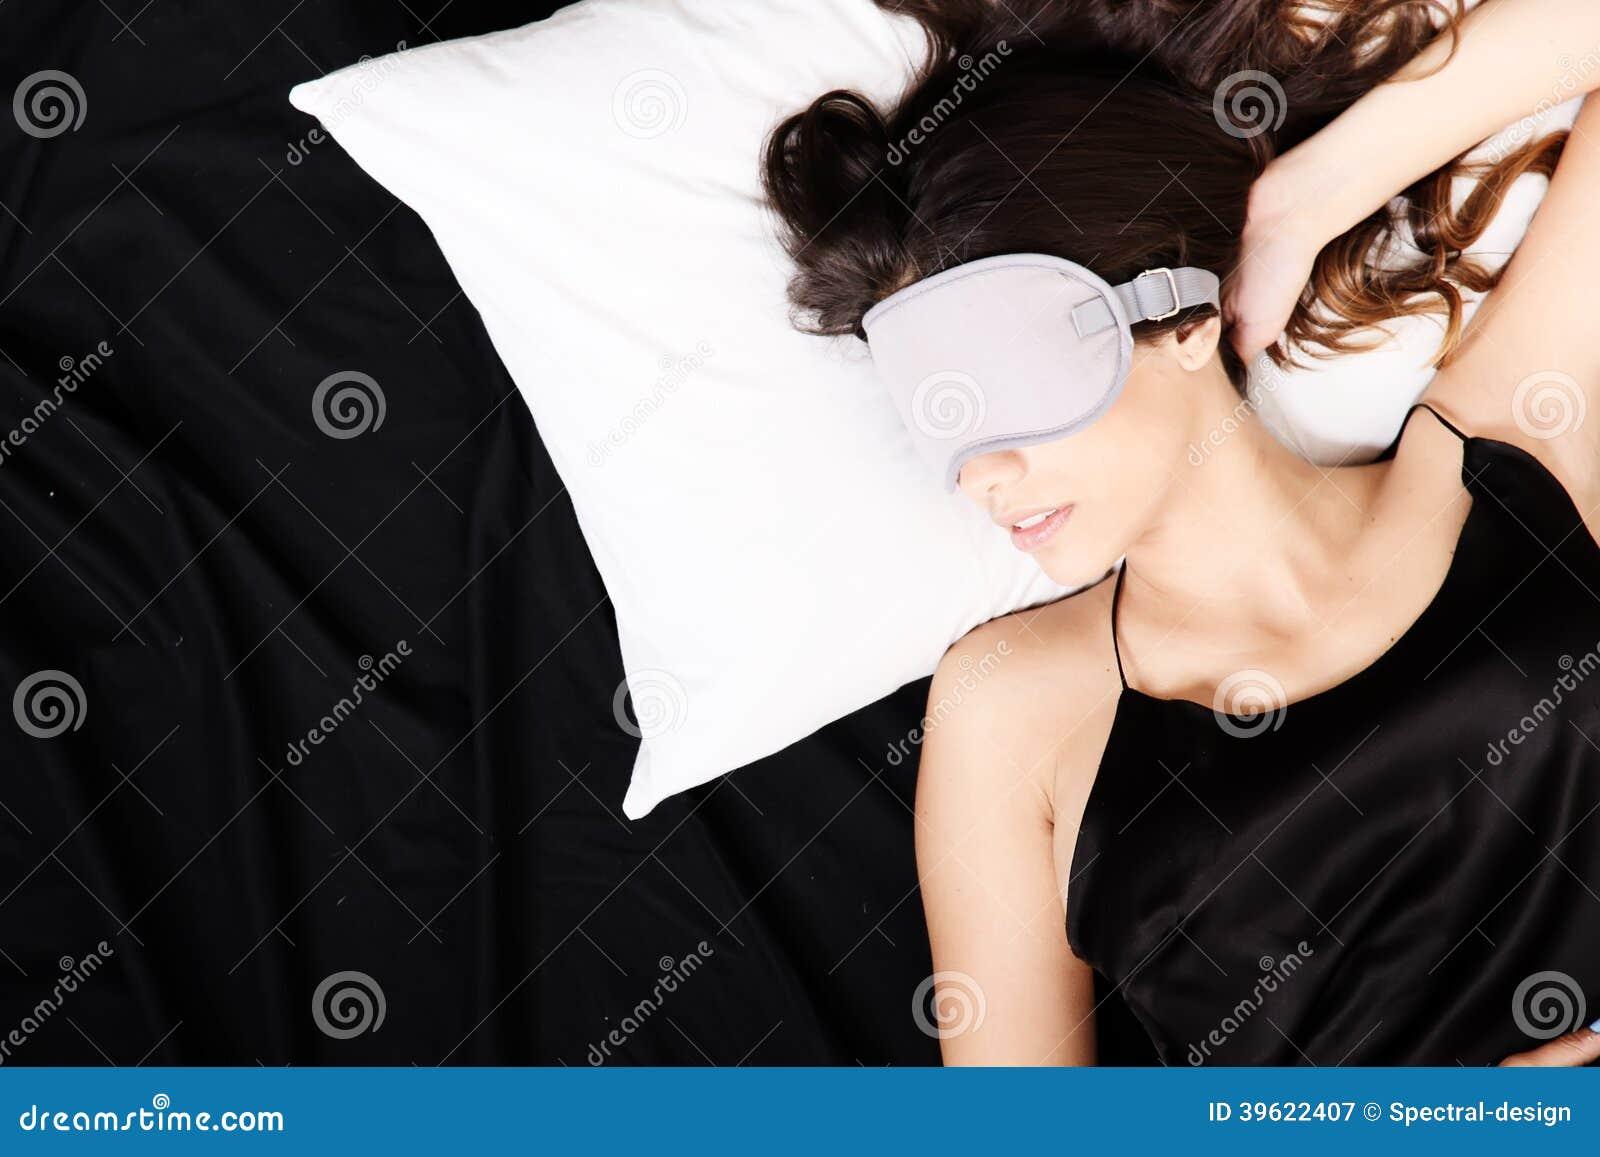 Young woman sleeping with Eyeshades